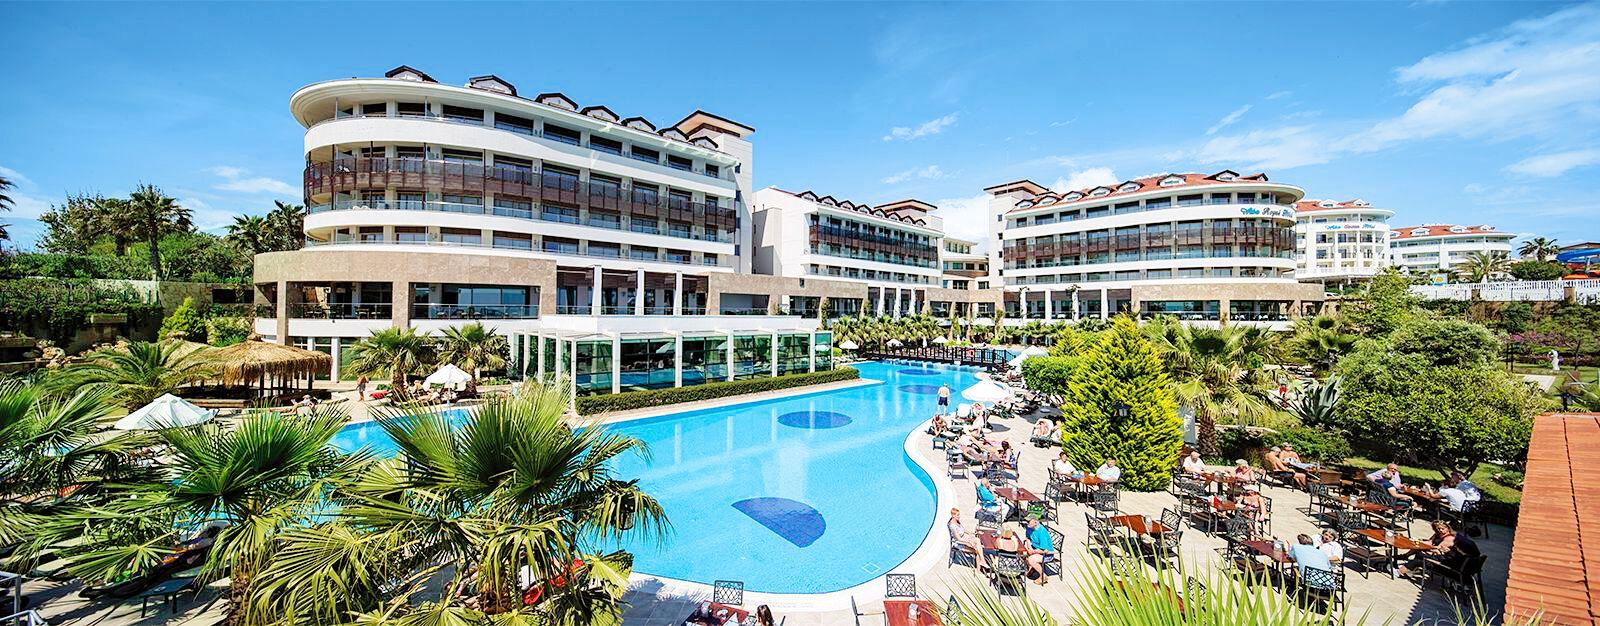 Turquie - Side - Hôtel Alba Royal 5*